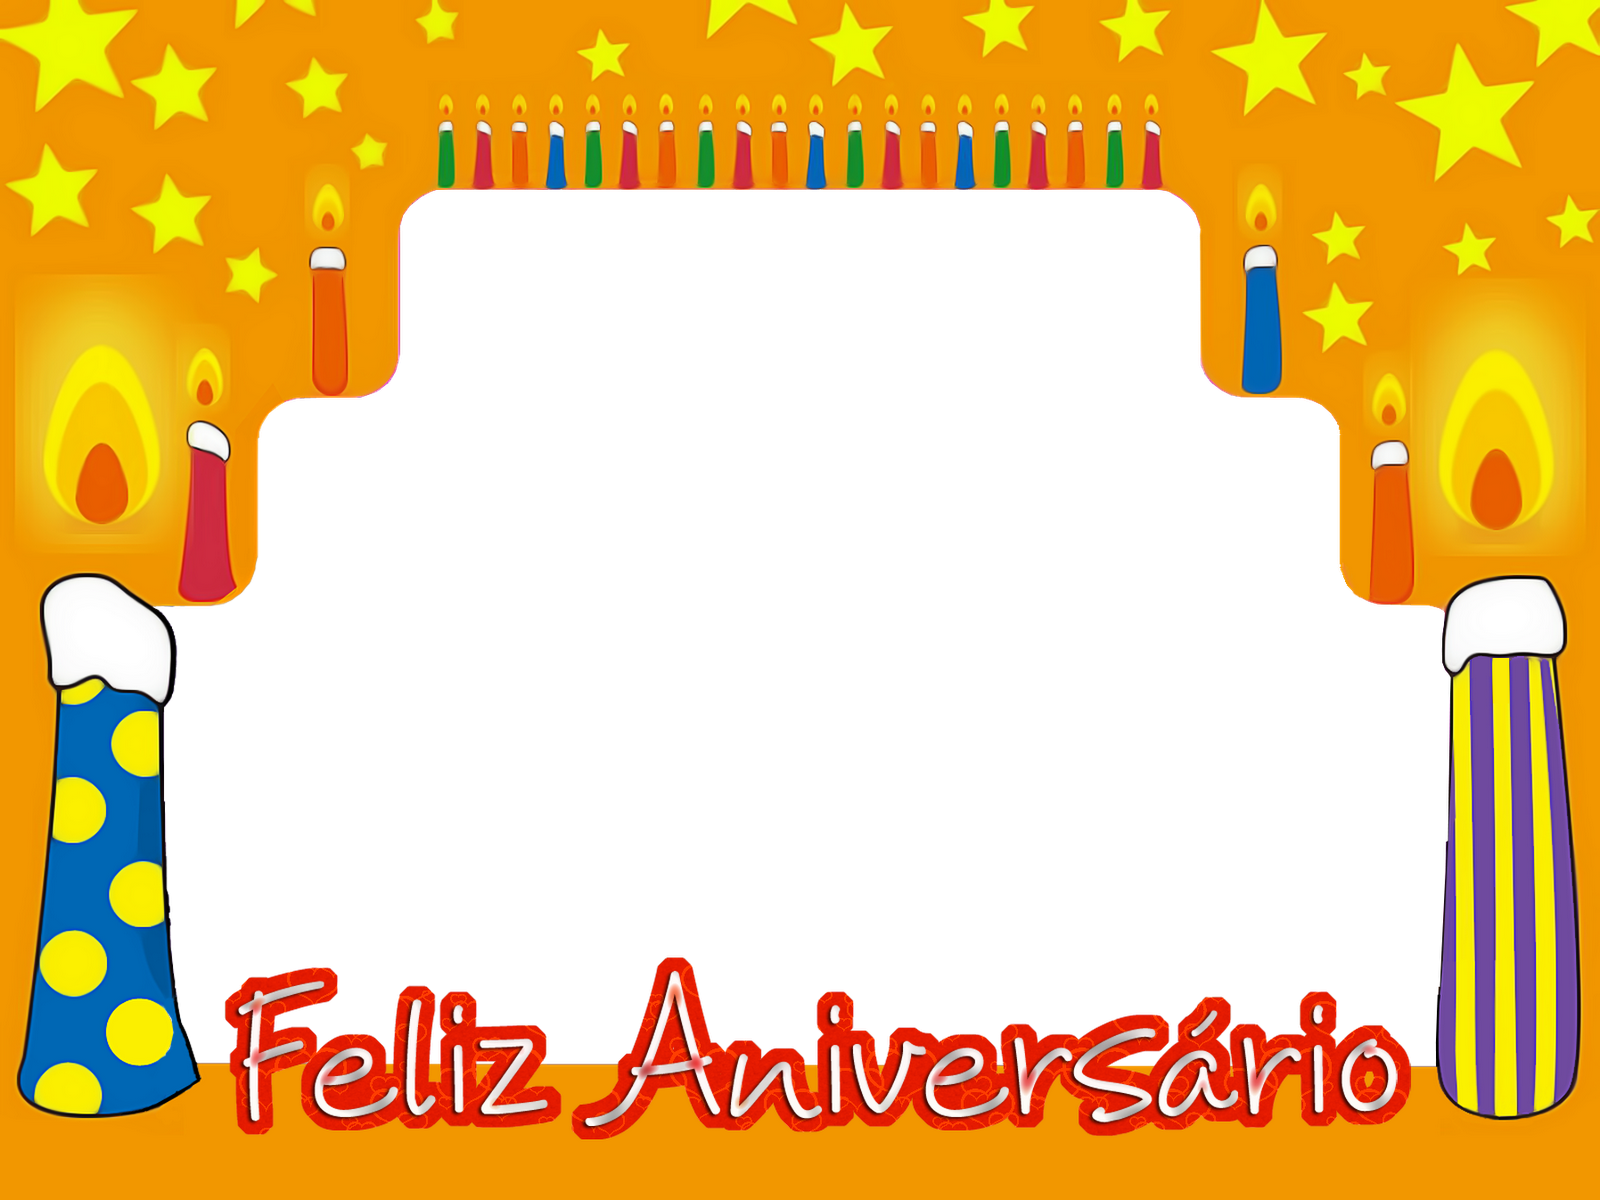 Feliz Aniversario Frases: Imagens - Imagens Feliz Aniversario